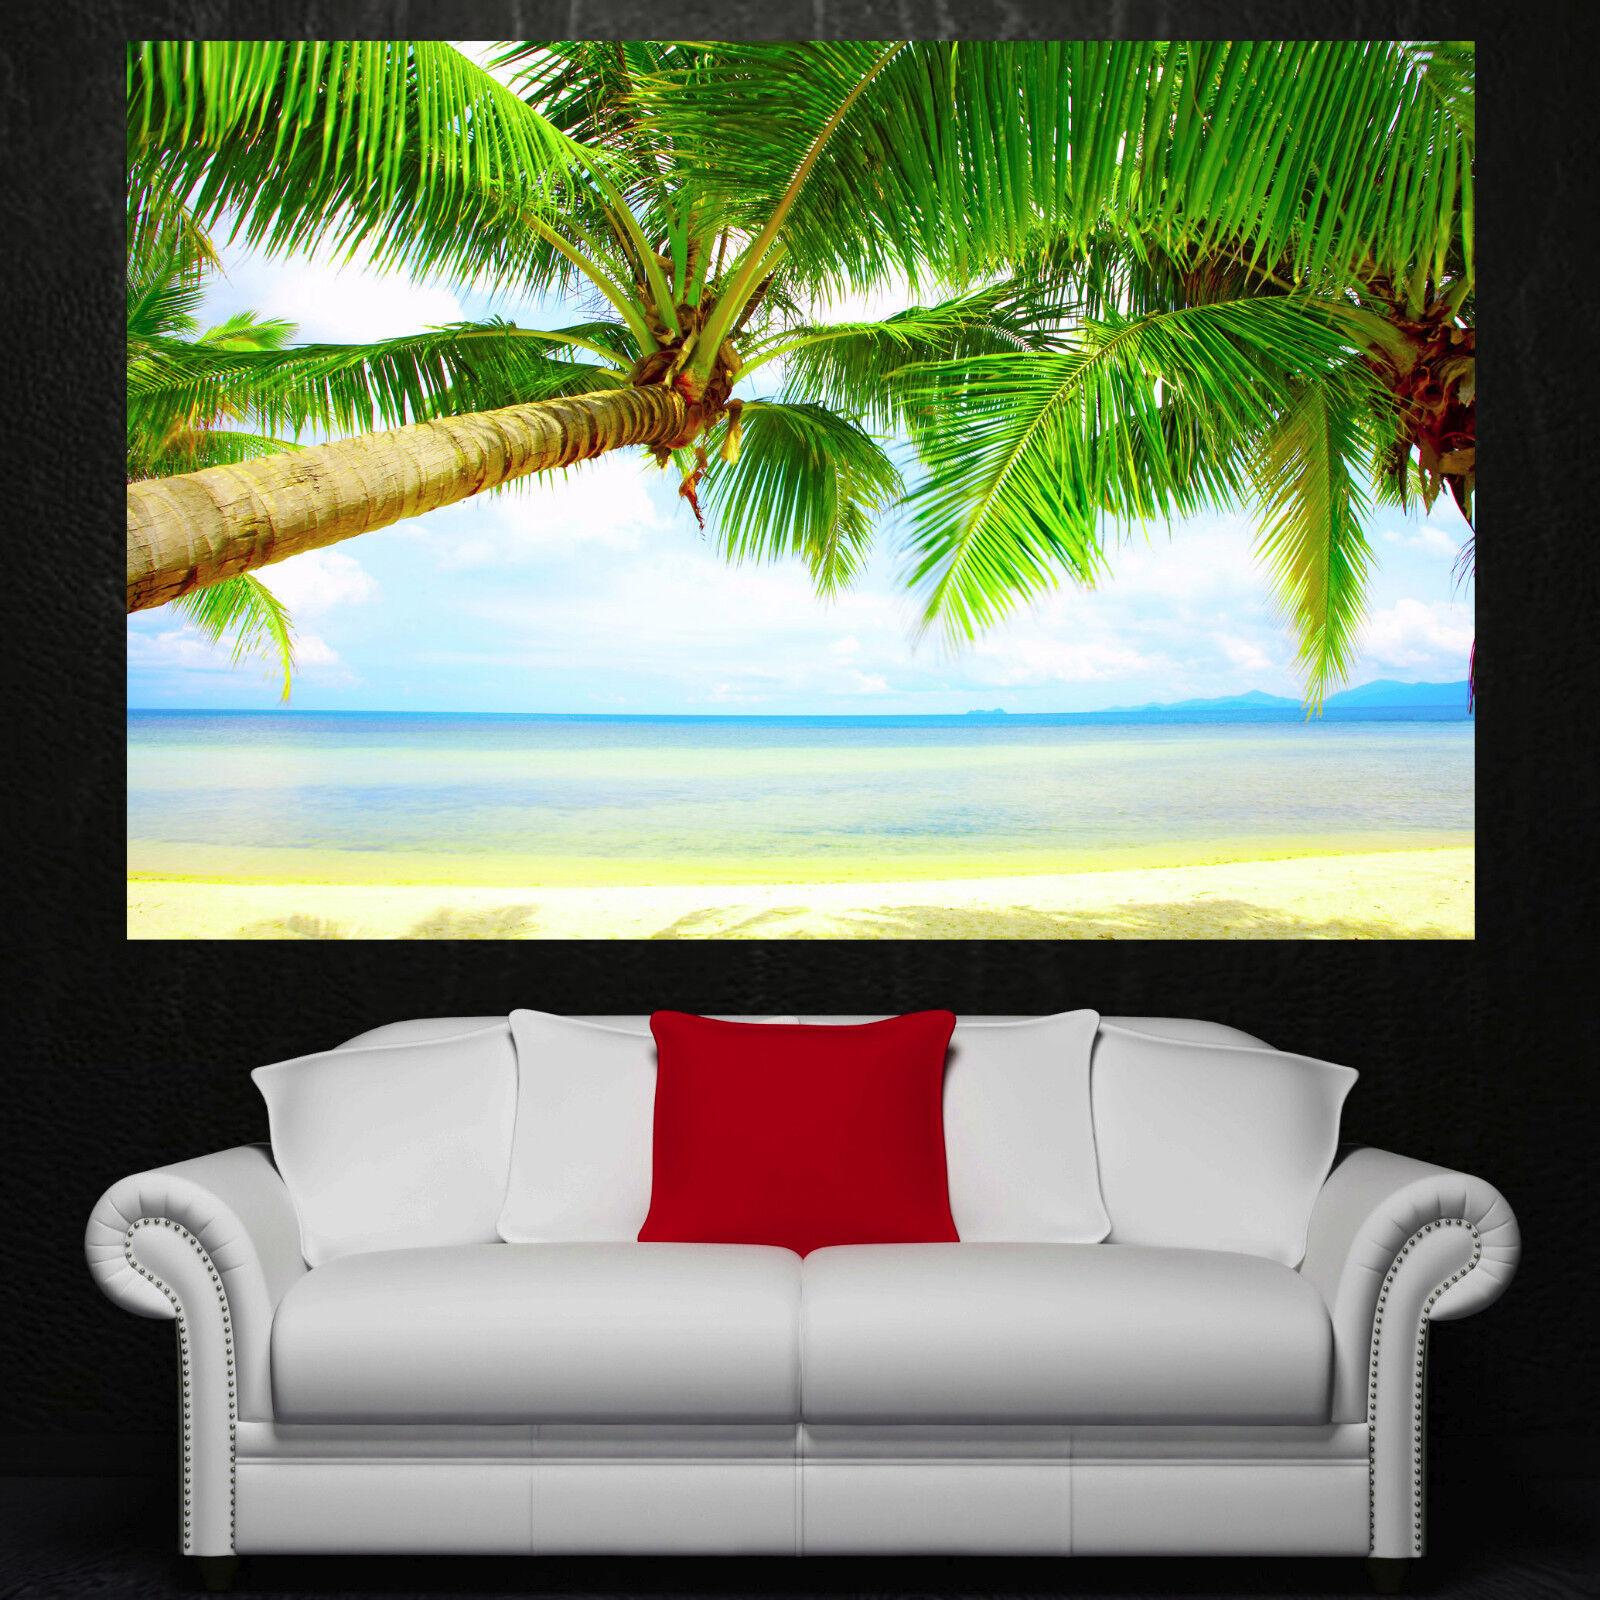 Beach Palm Tree Sky Canvas Home Decor Wall Art Prints Photo Farbeful Picture 1 2